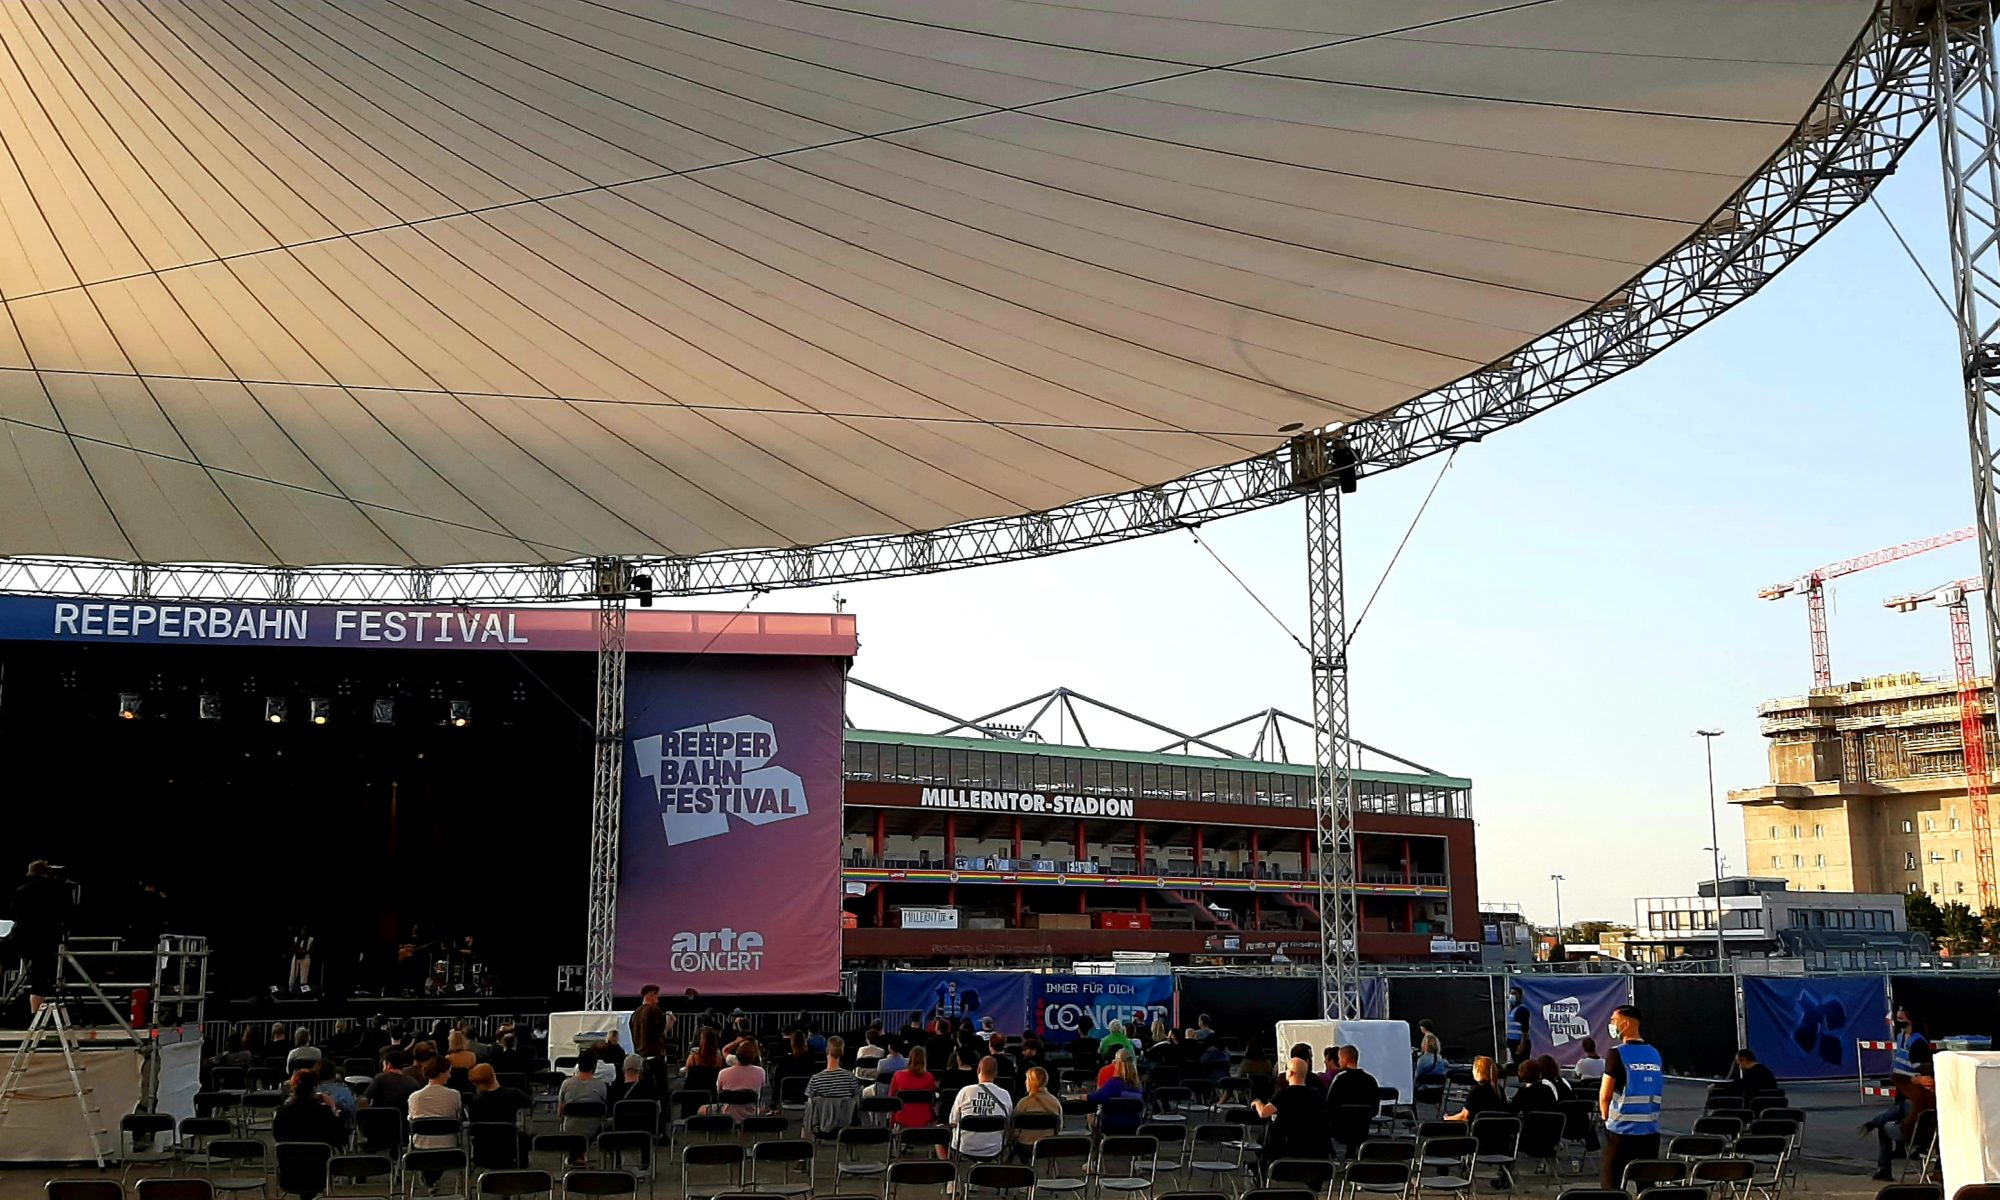 Bühne, Corona, Reeperbahn Festival, Hamburg, Clubs, Konzerte, St. Pauli, Konferenz, Musikbranche, Social Distancing, Check-in